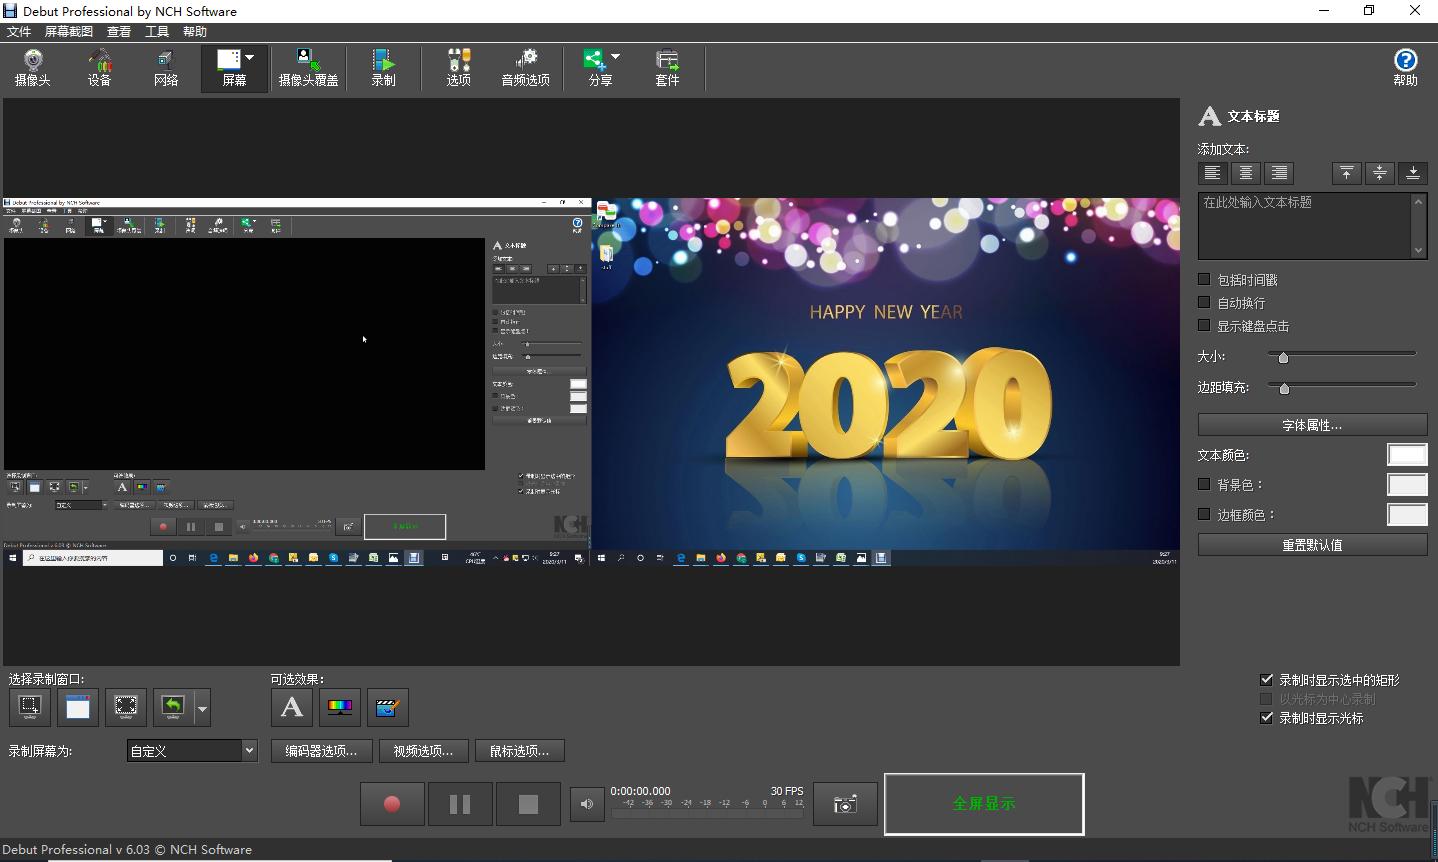 NCH Debut视频录制和屏幕捕捉录屏截图软件截图2